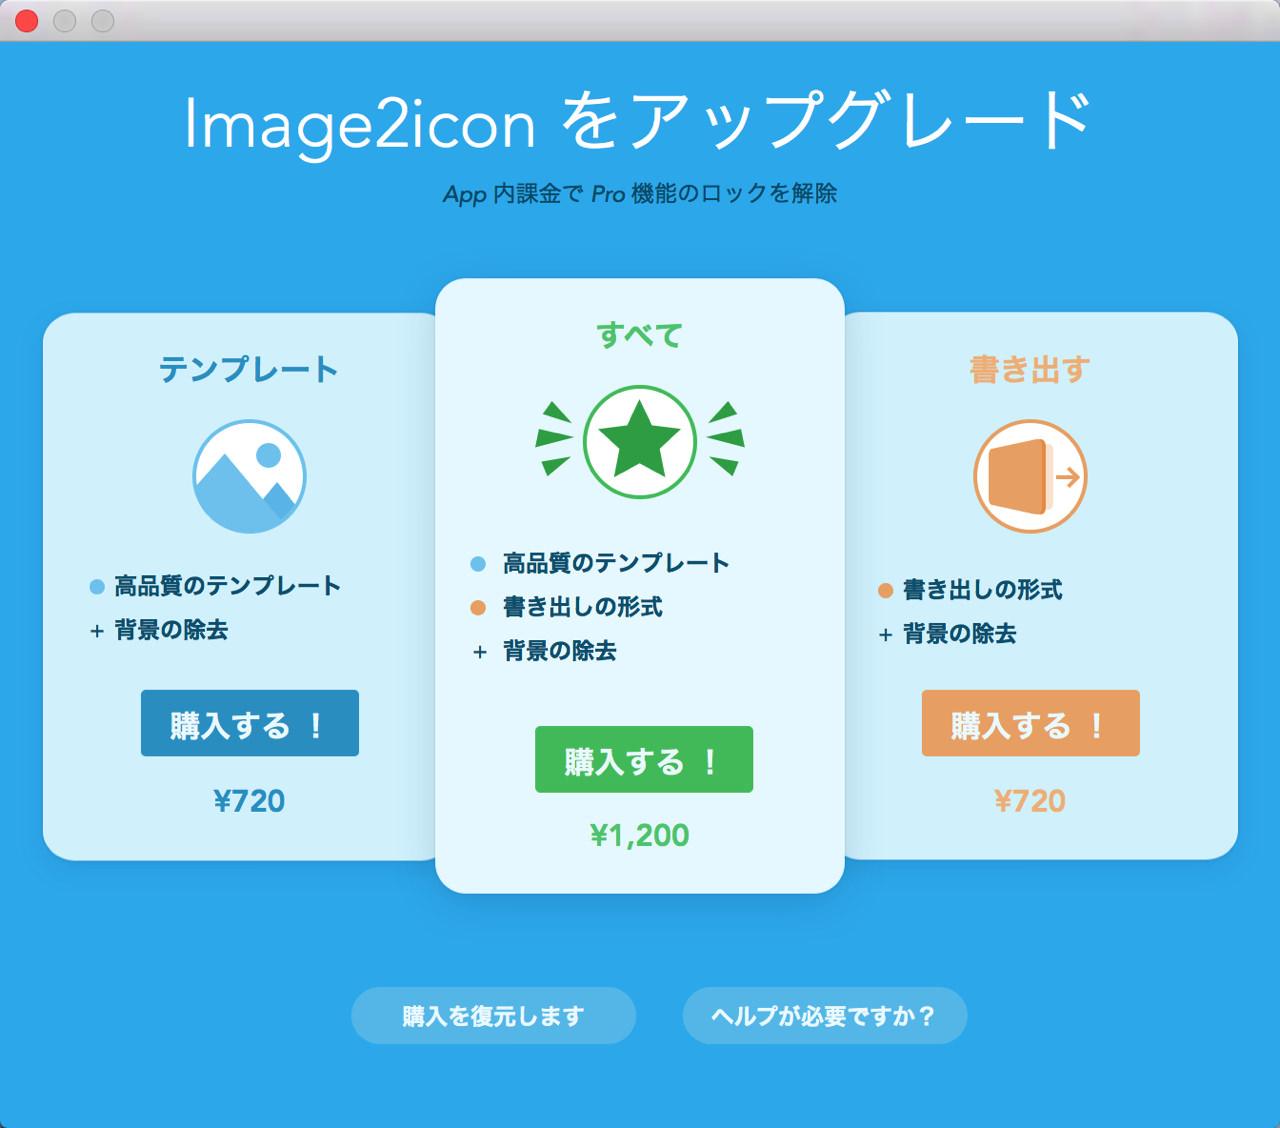 Image2icon4